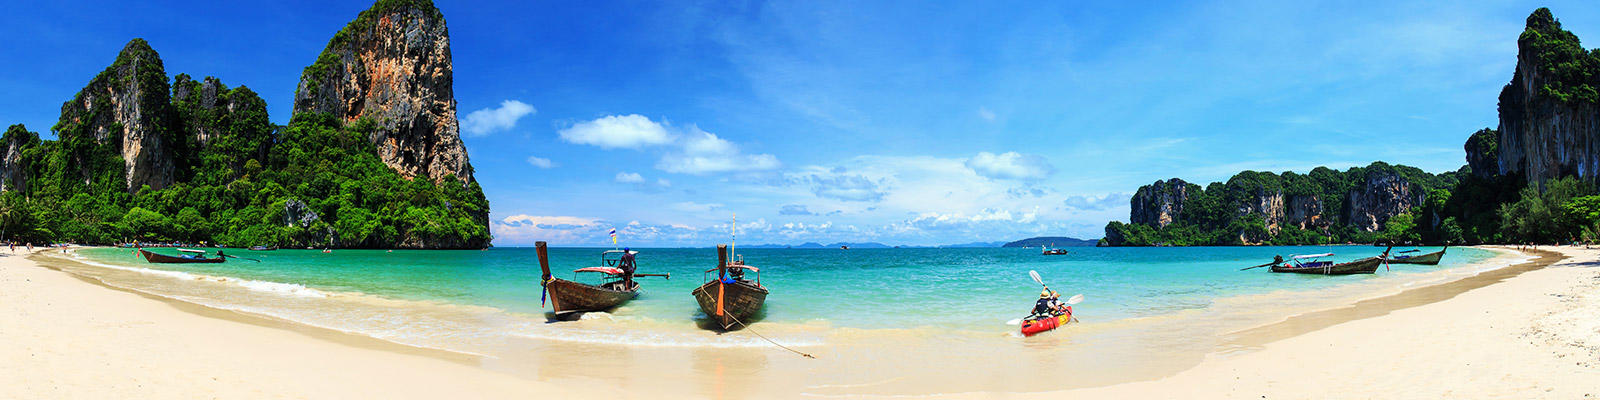 fcza-blog-escape-the-crowds-in-thailand